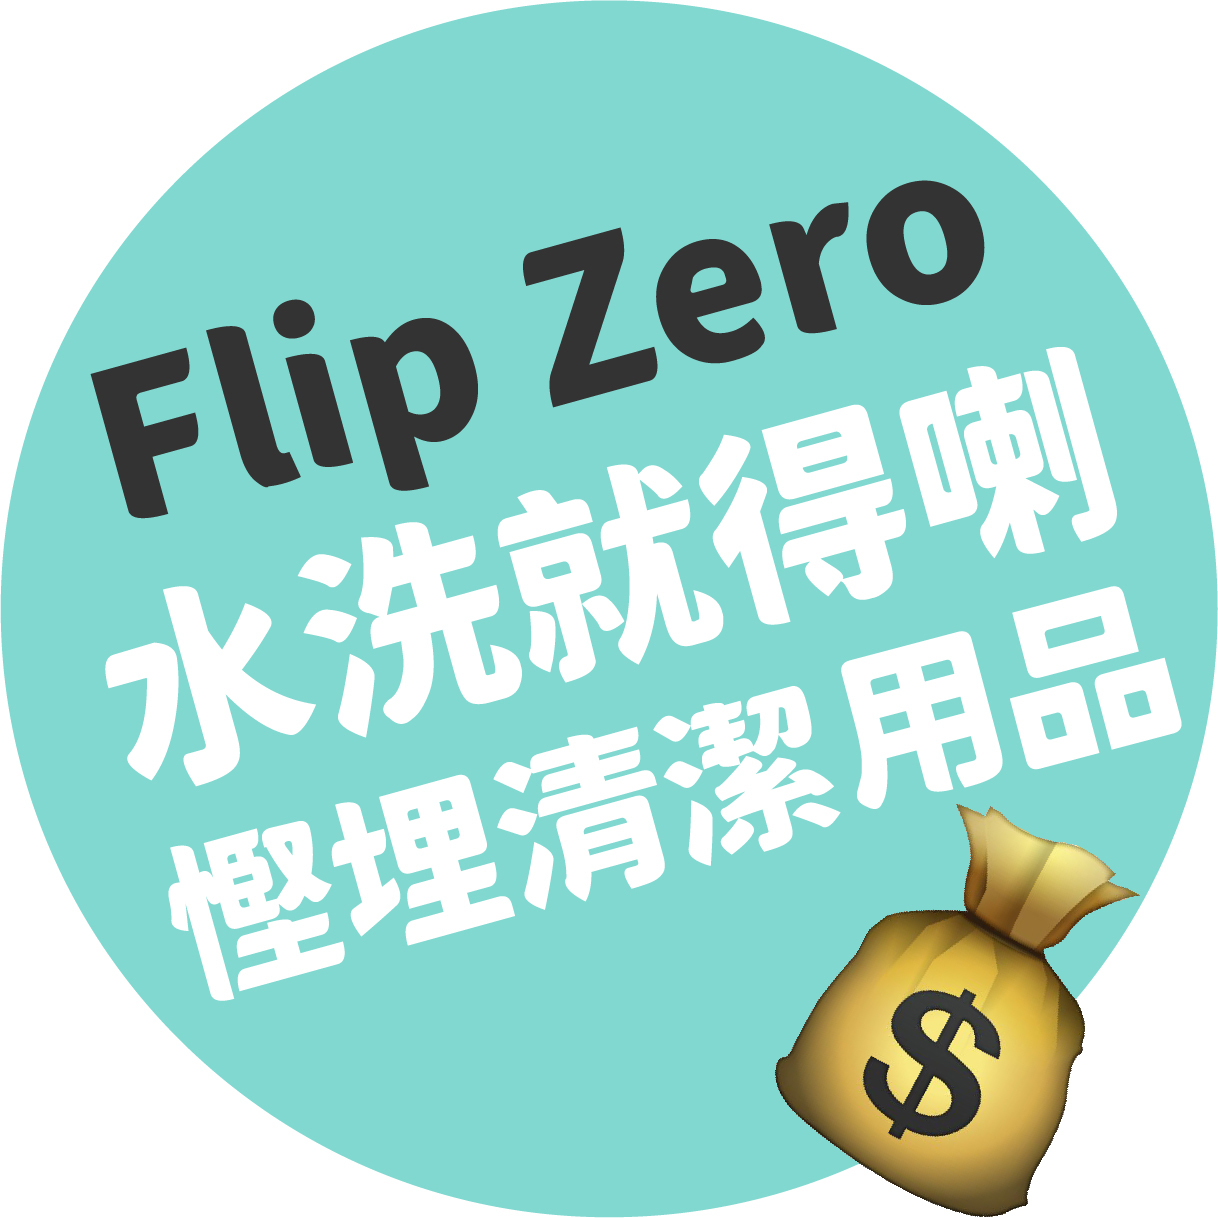 flipzero